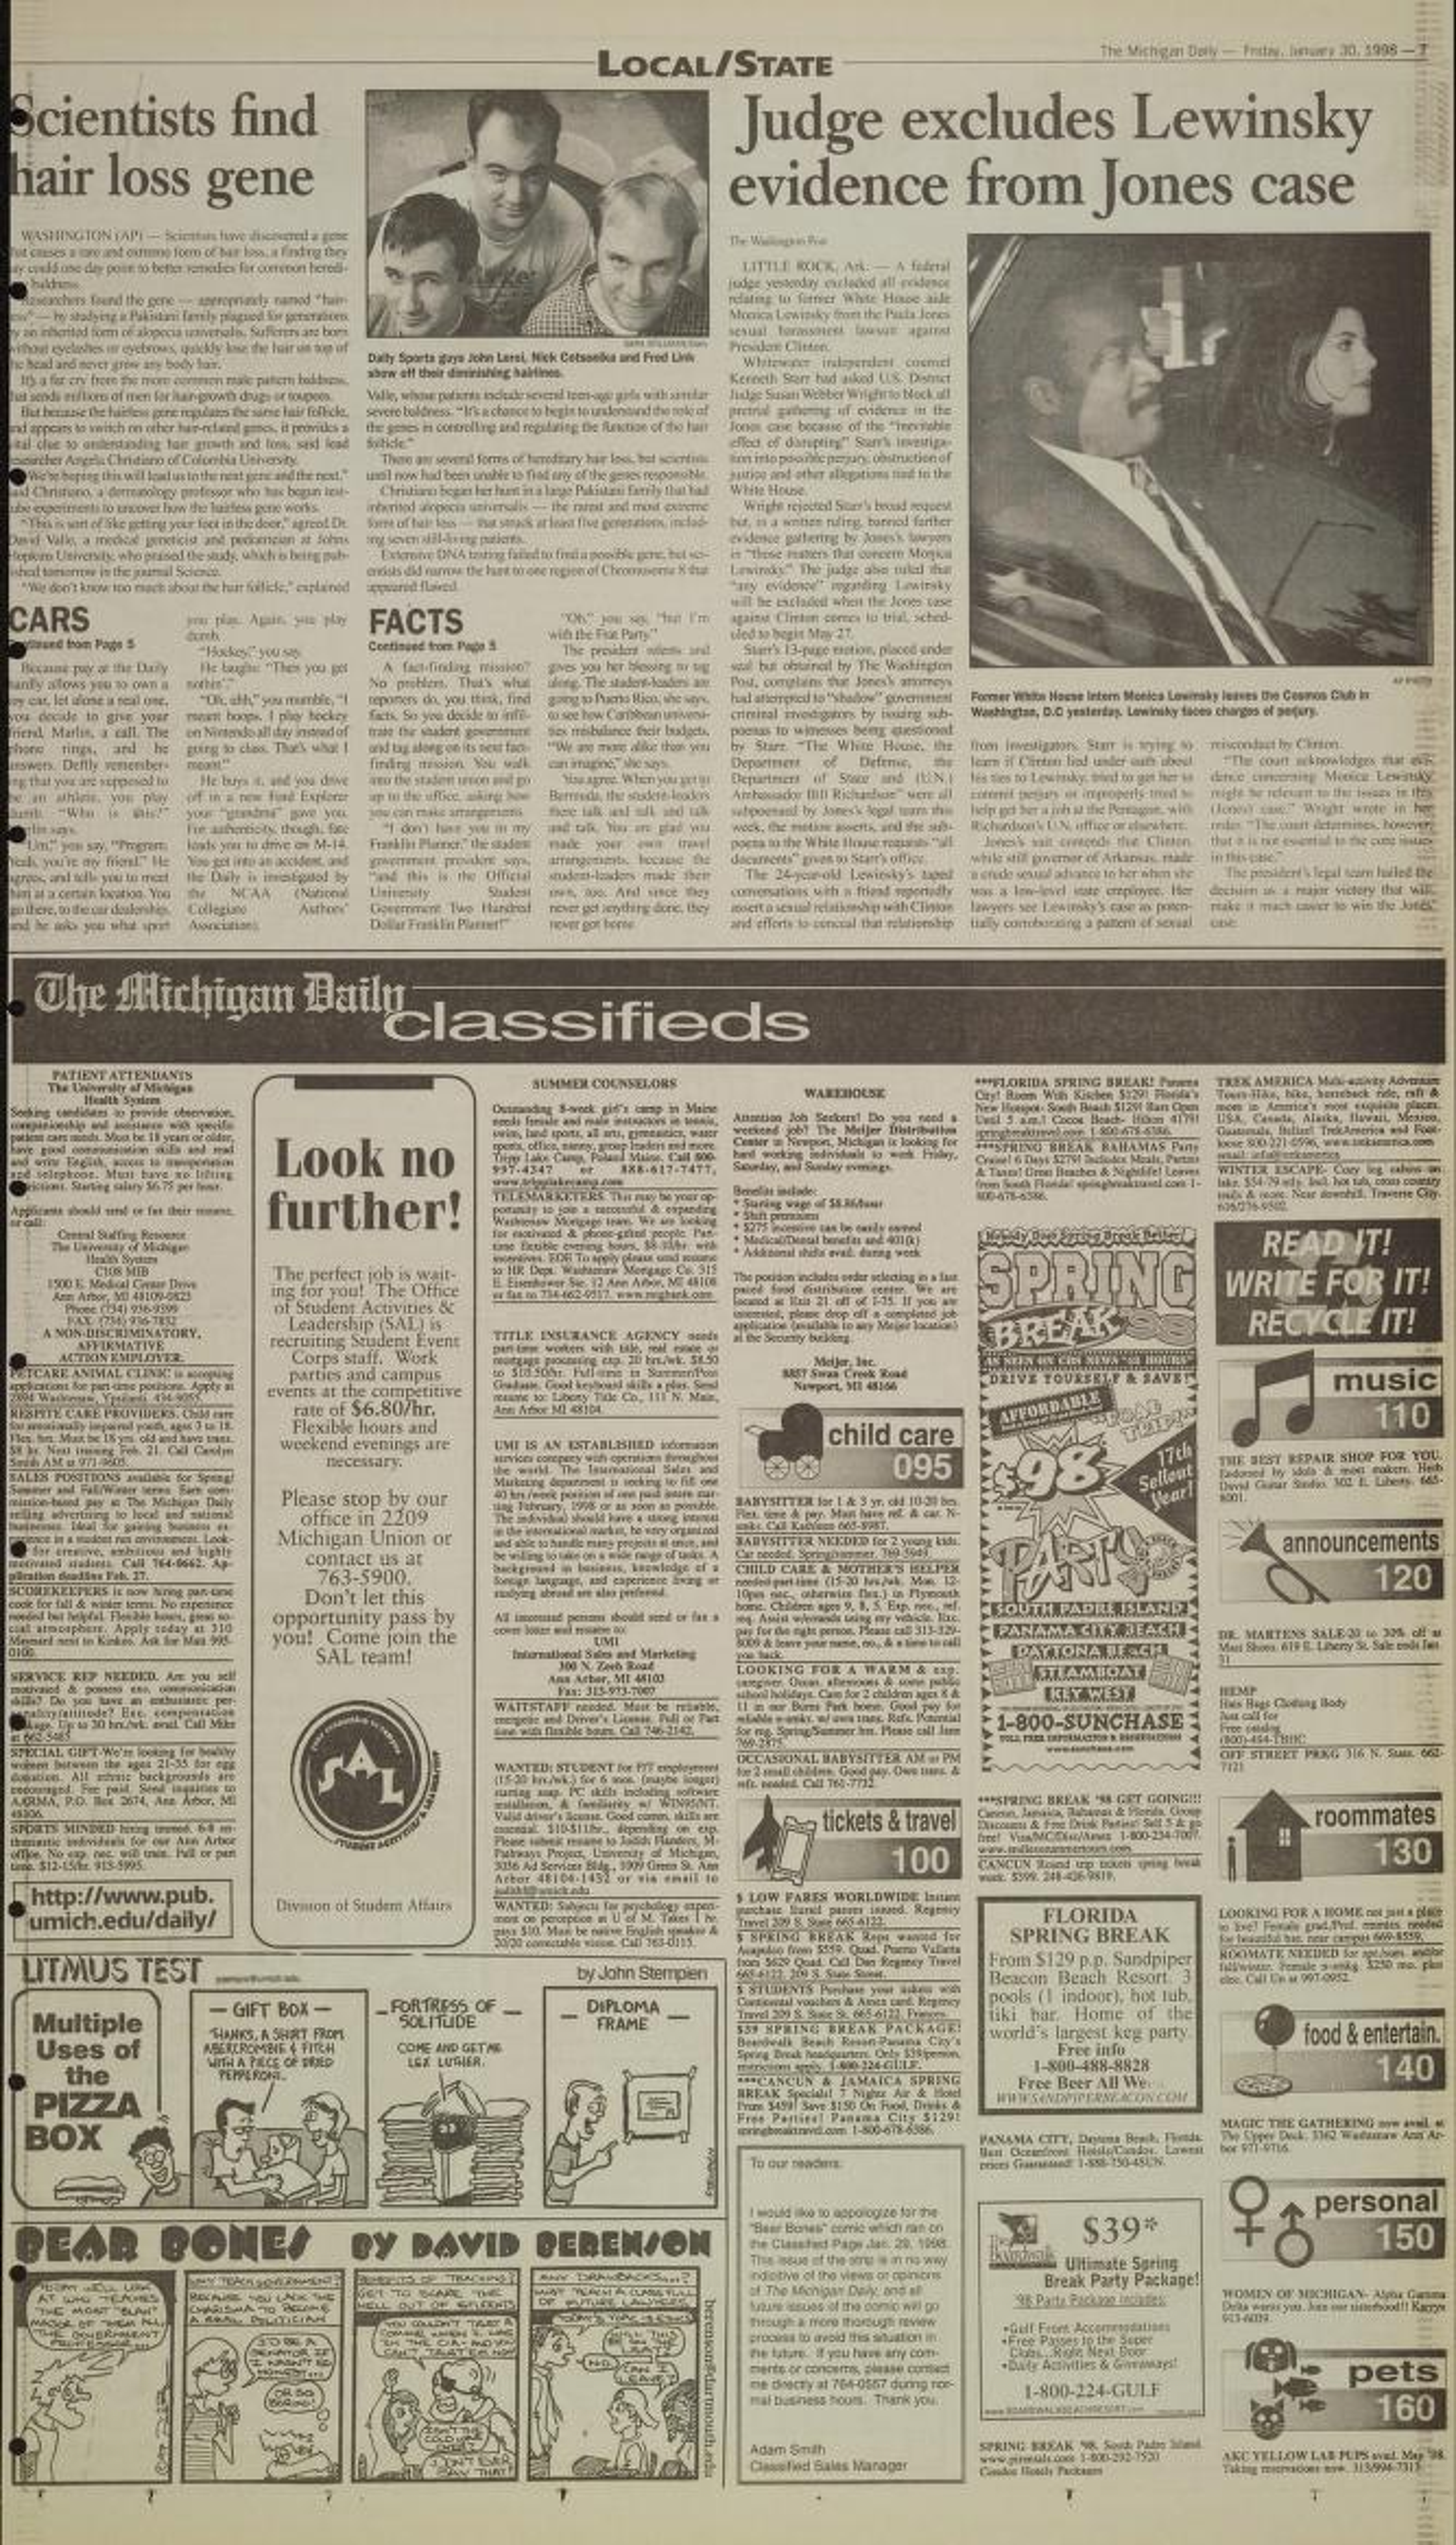 Michigan Daily Digital Archives - January 30, 1998 (vol  108